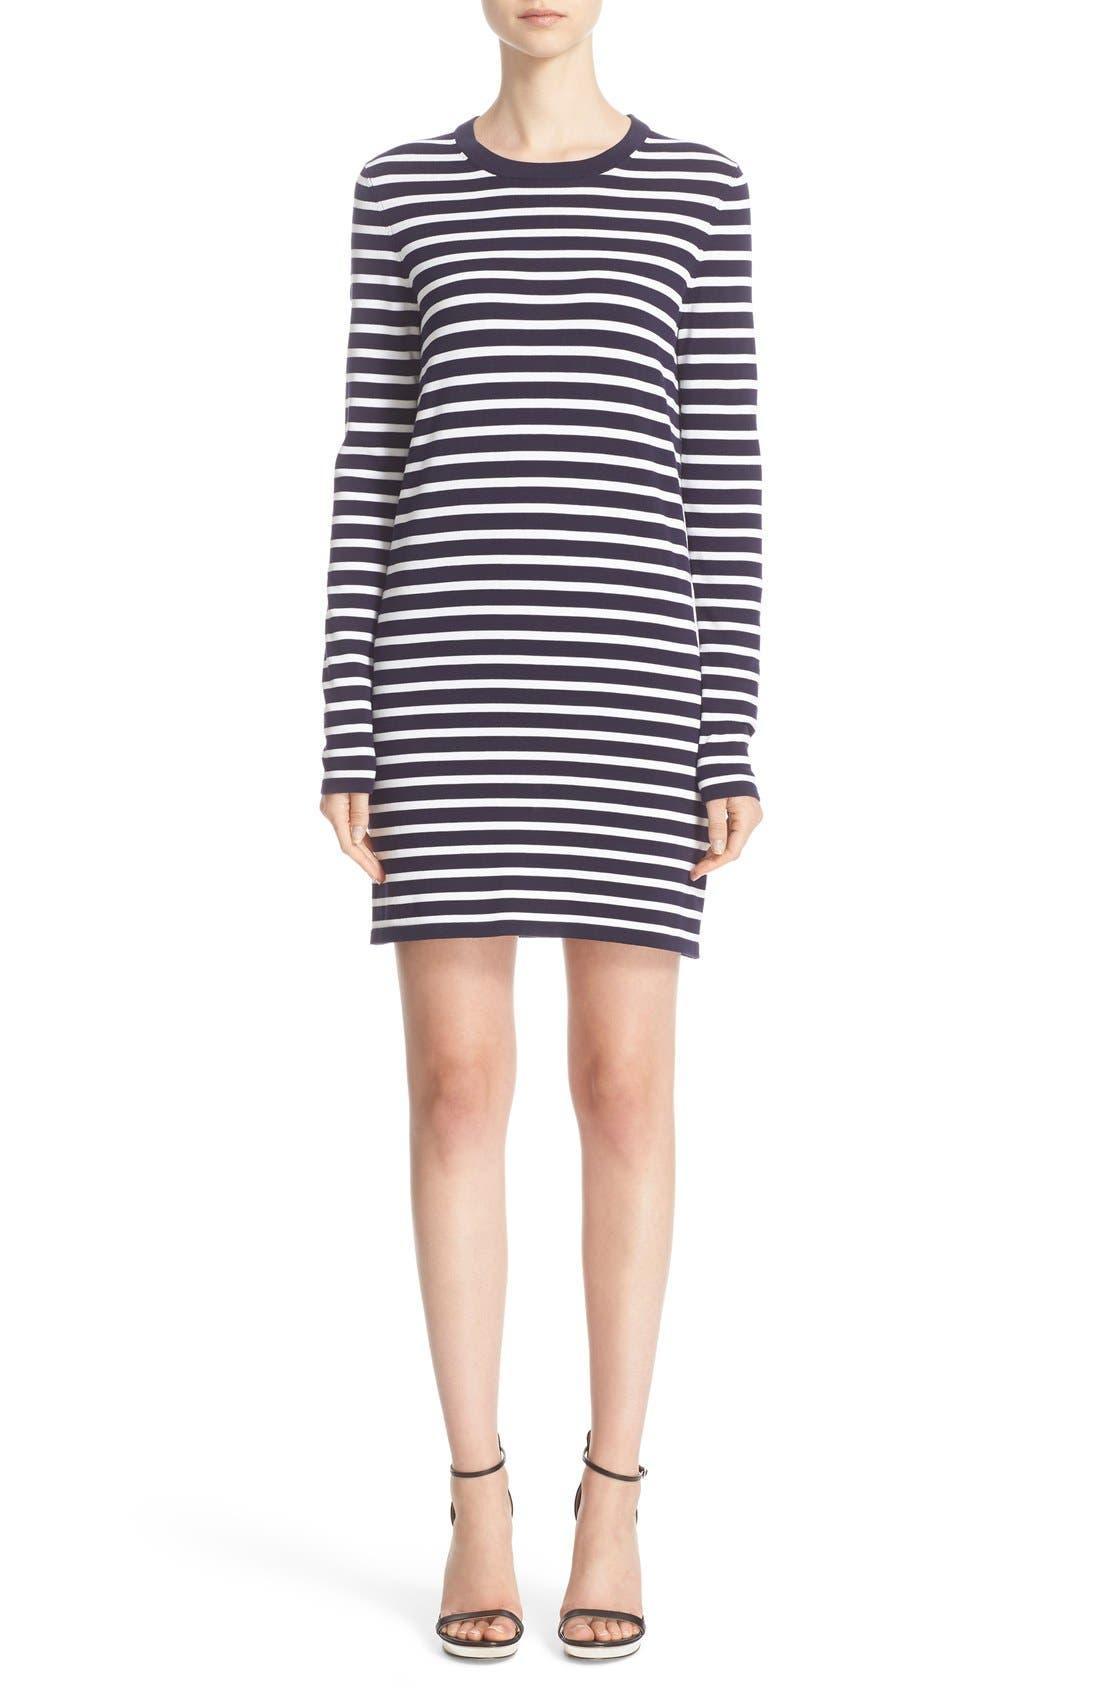 Main Image - Michael Kors Stripe T-Shirt Dress